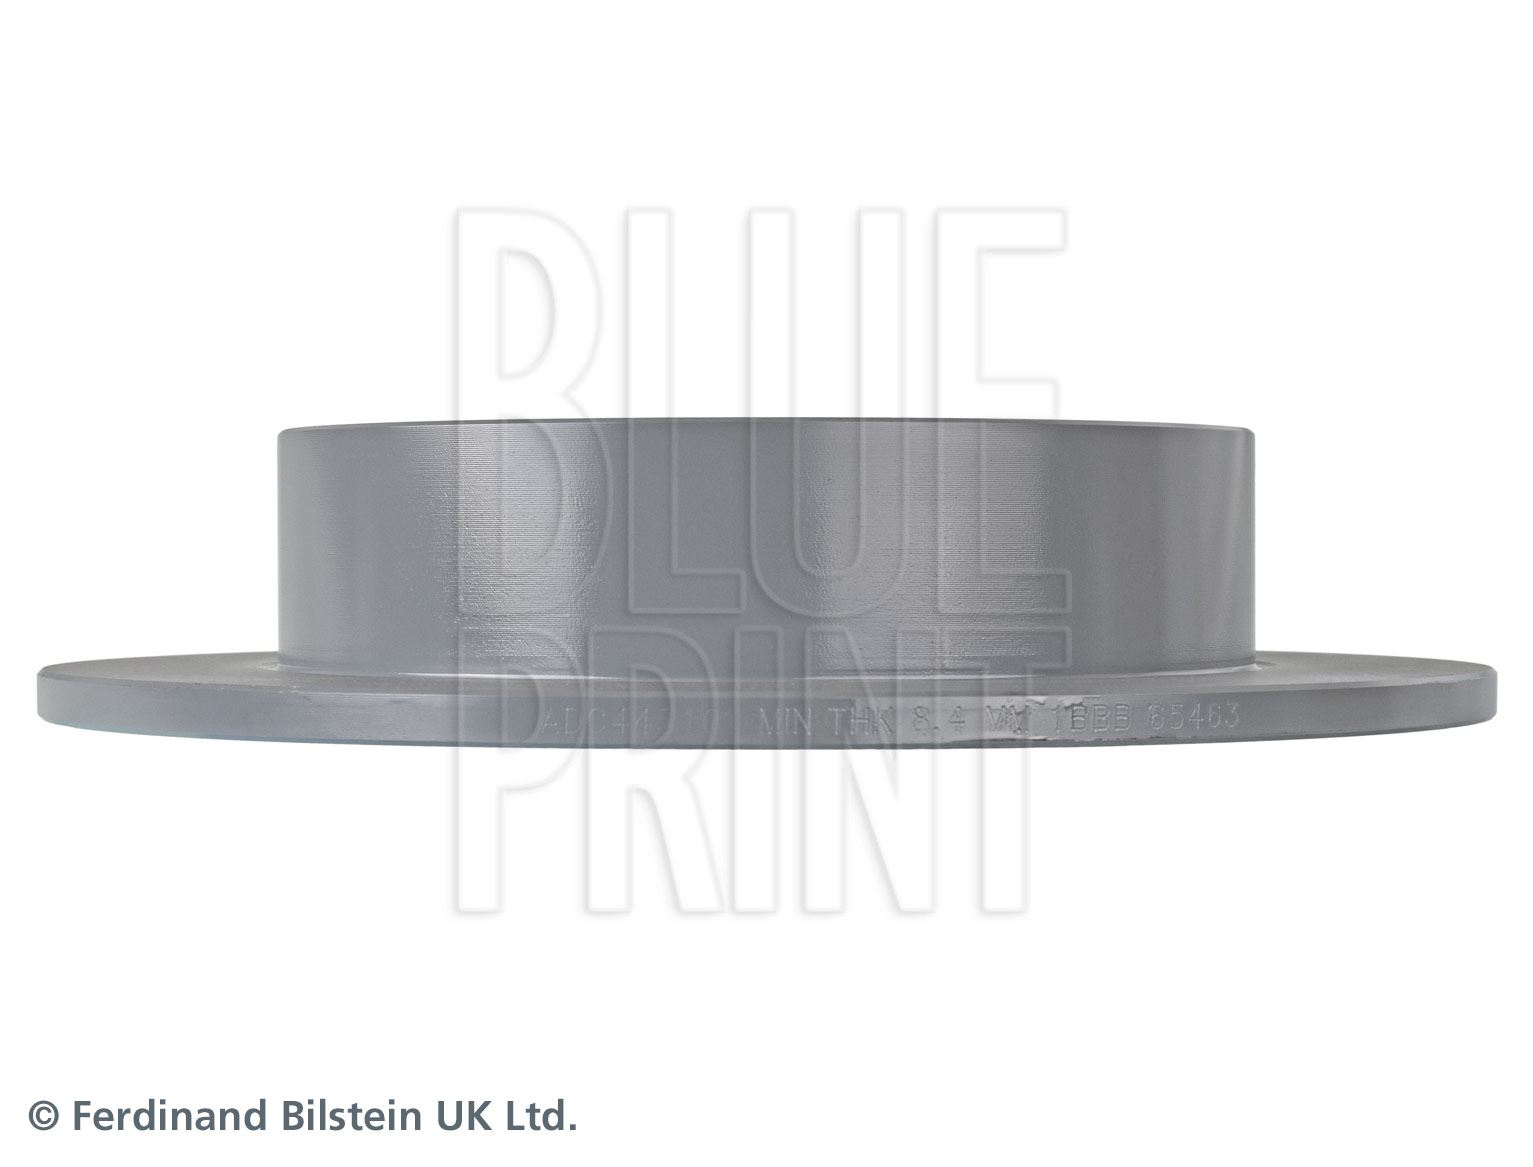 PDKR537 EBC Rear Brake Kit Ultimax Pads /& Standard Discs